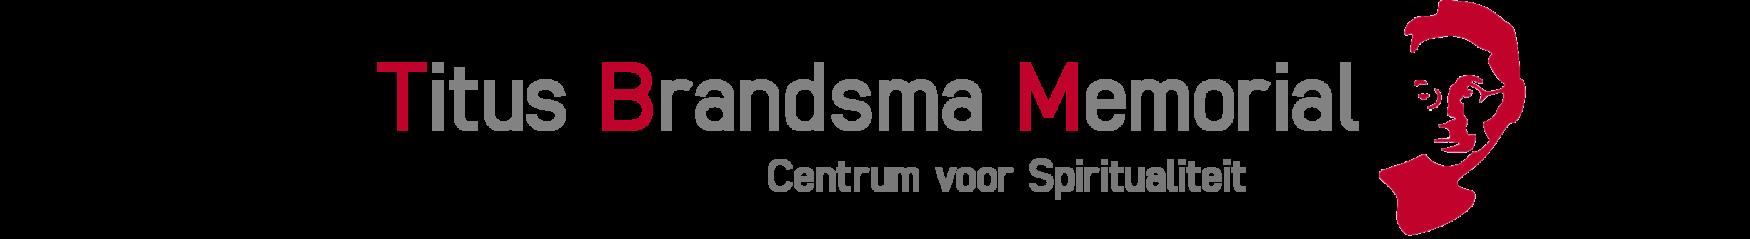 Titus Brandsma Memorial Logo